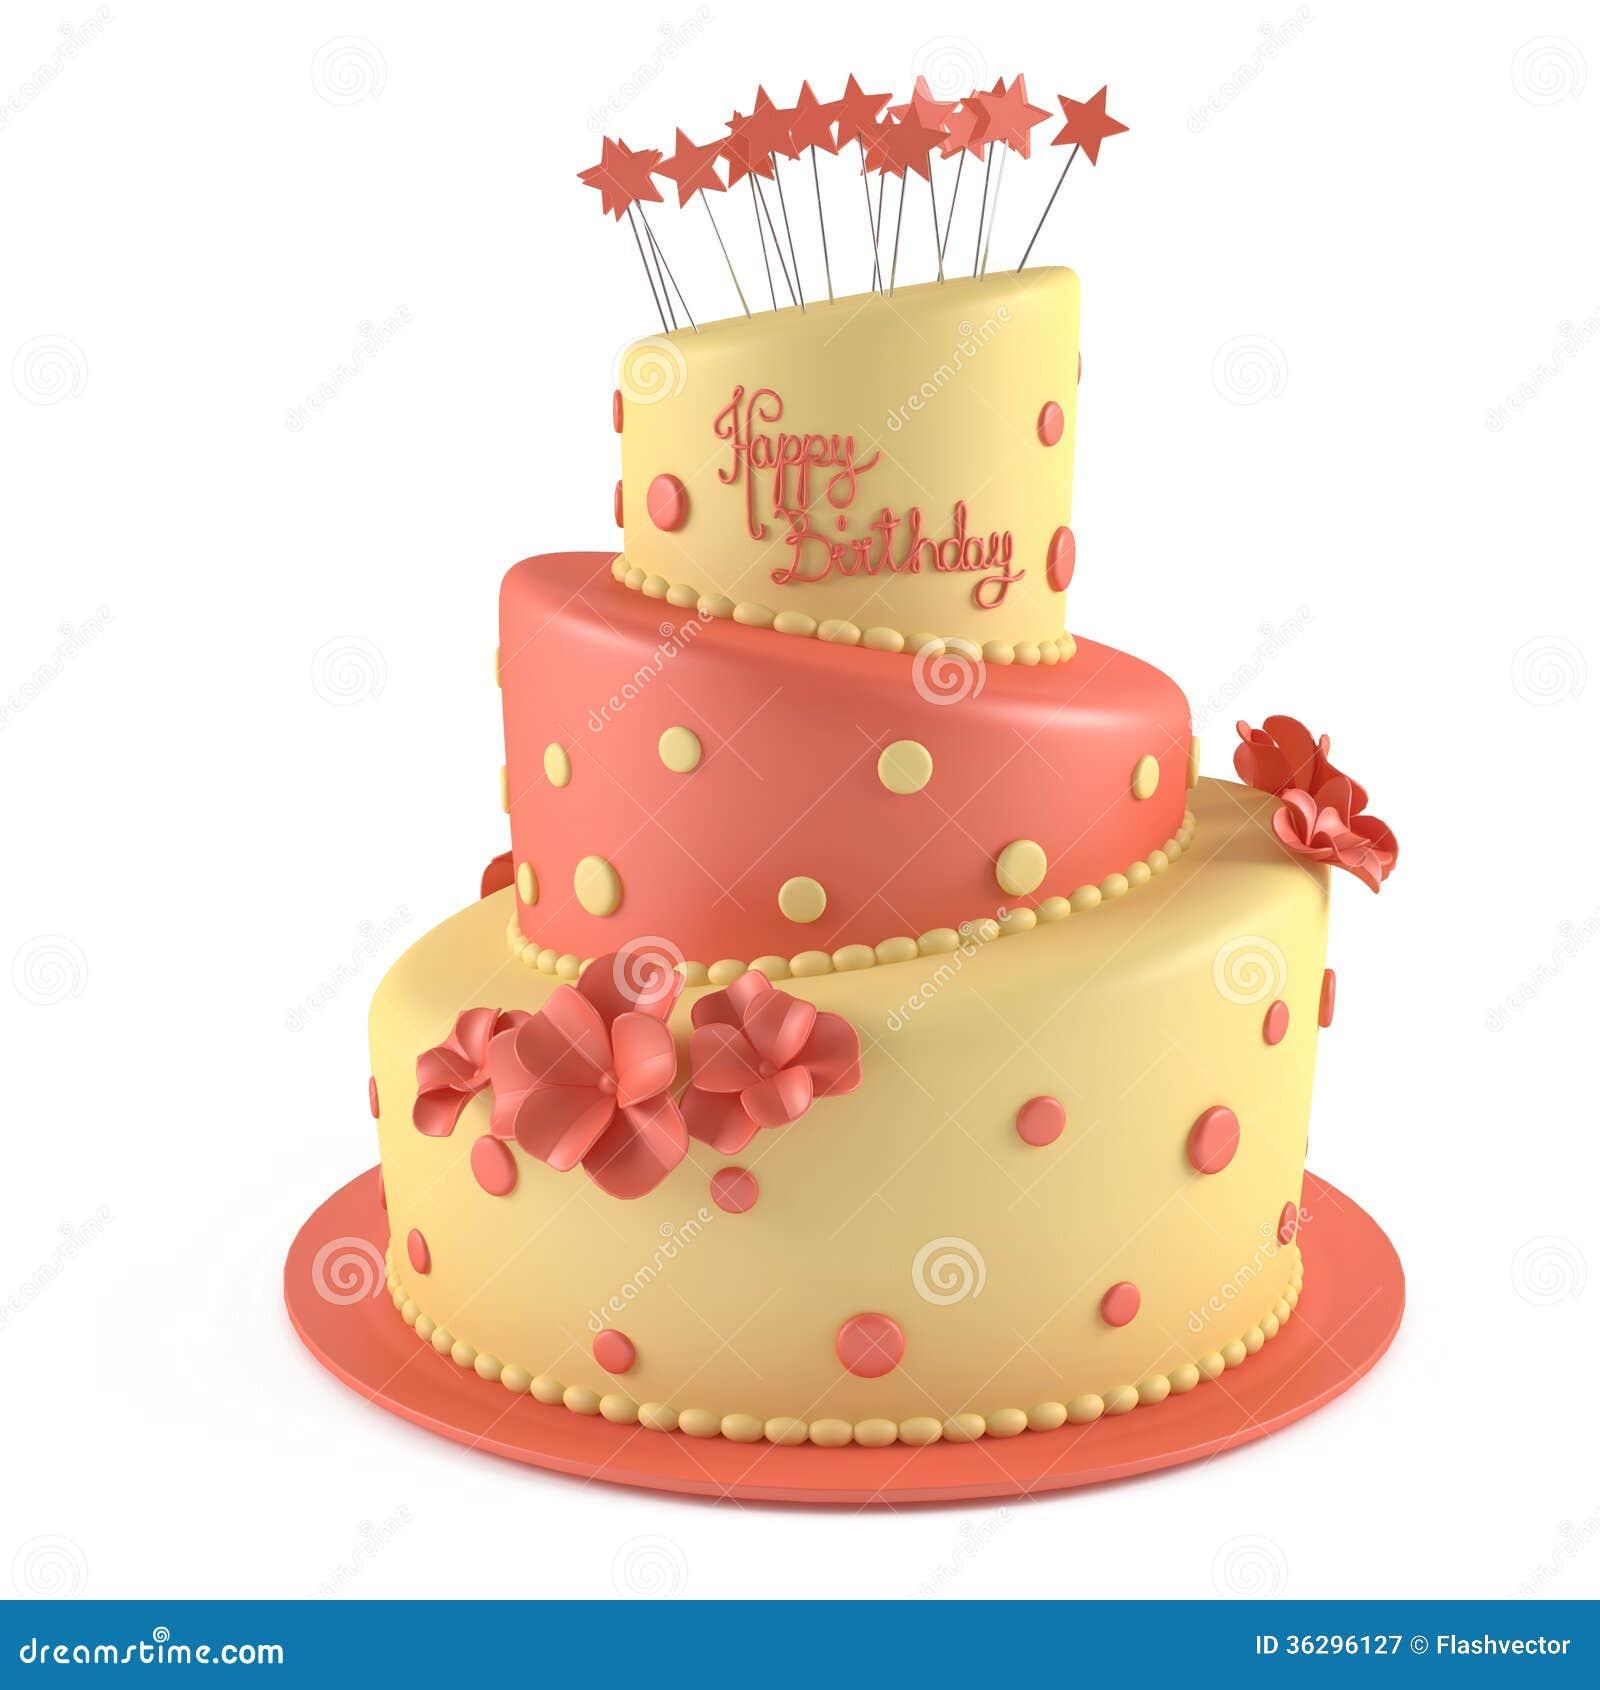 Birthday Cake Isolated Stock Illustration. Image Of Star